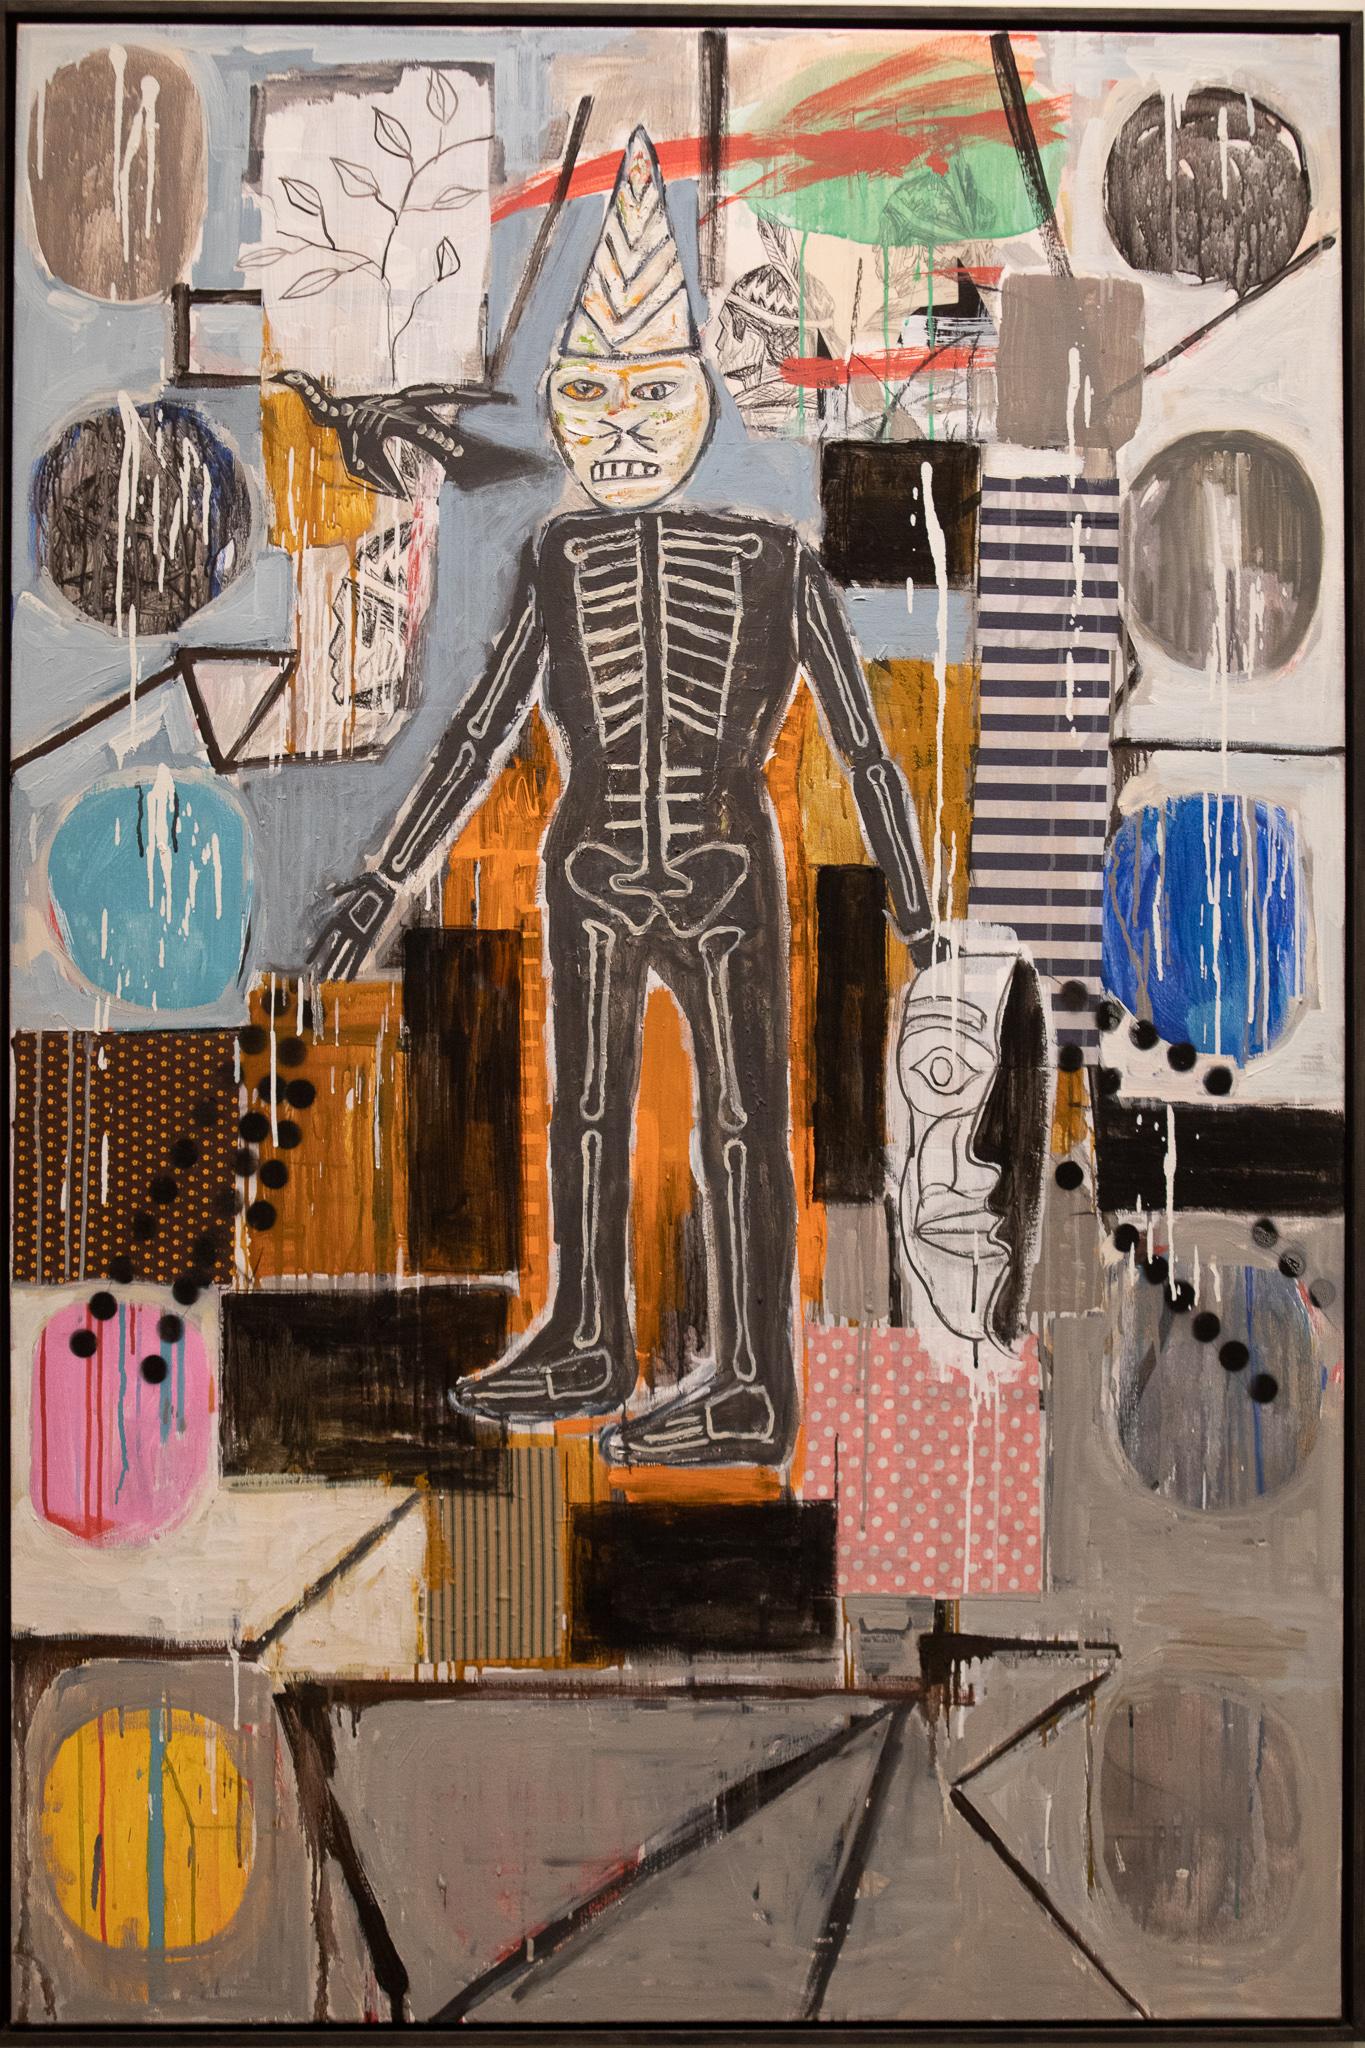 U2A3875 - Sheldon art exhibition shows waste drives human life